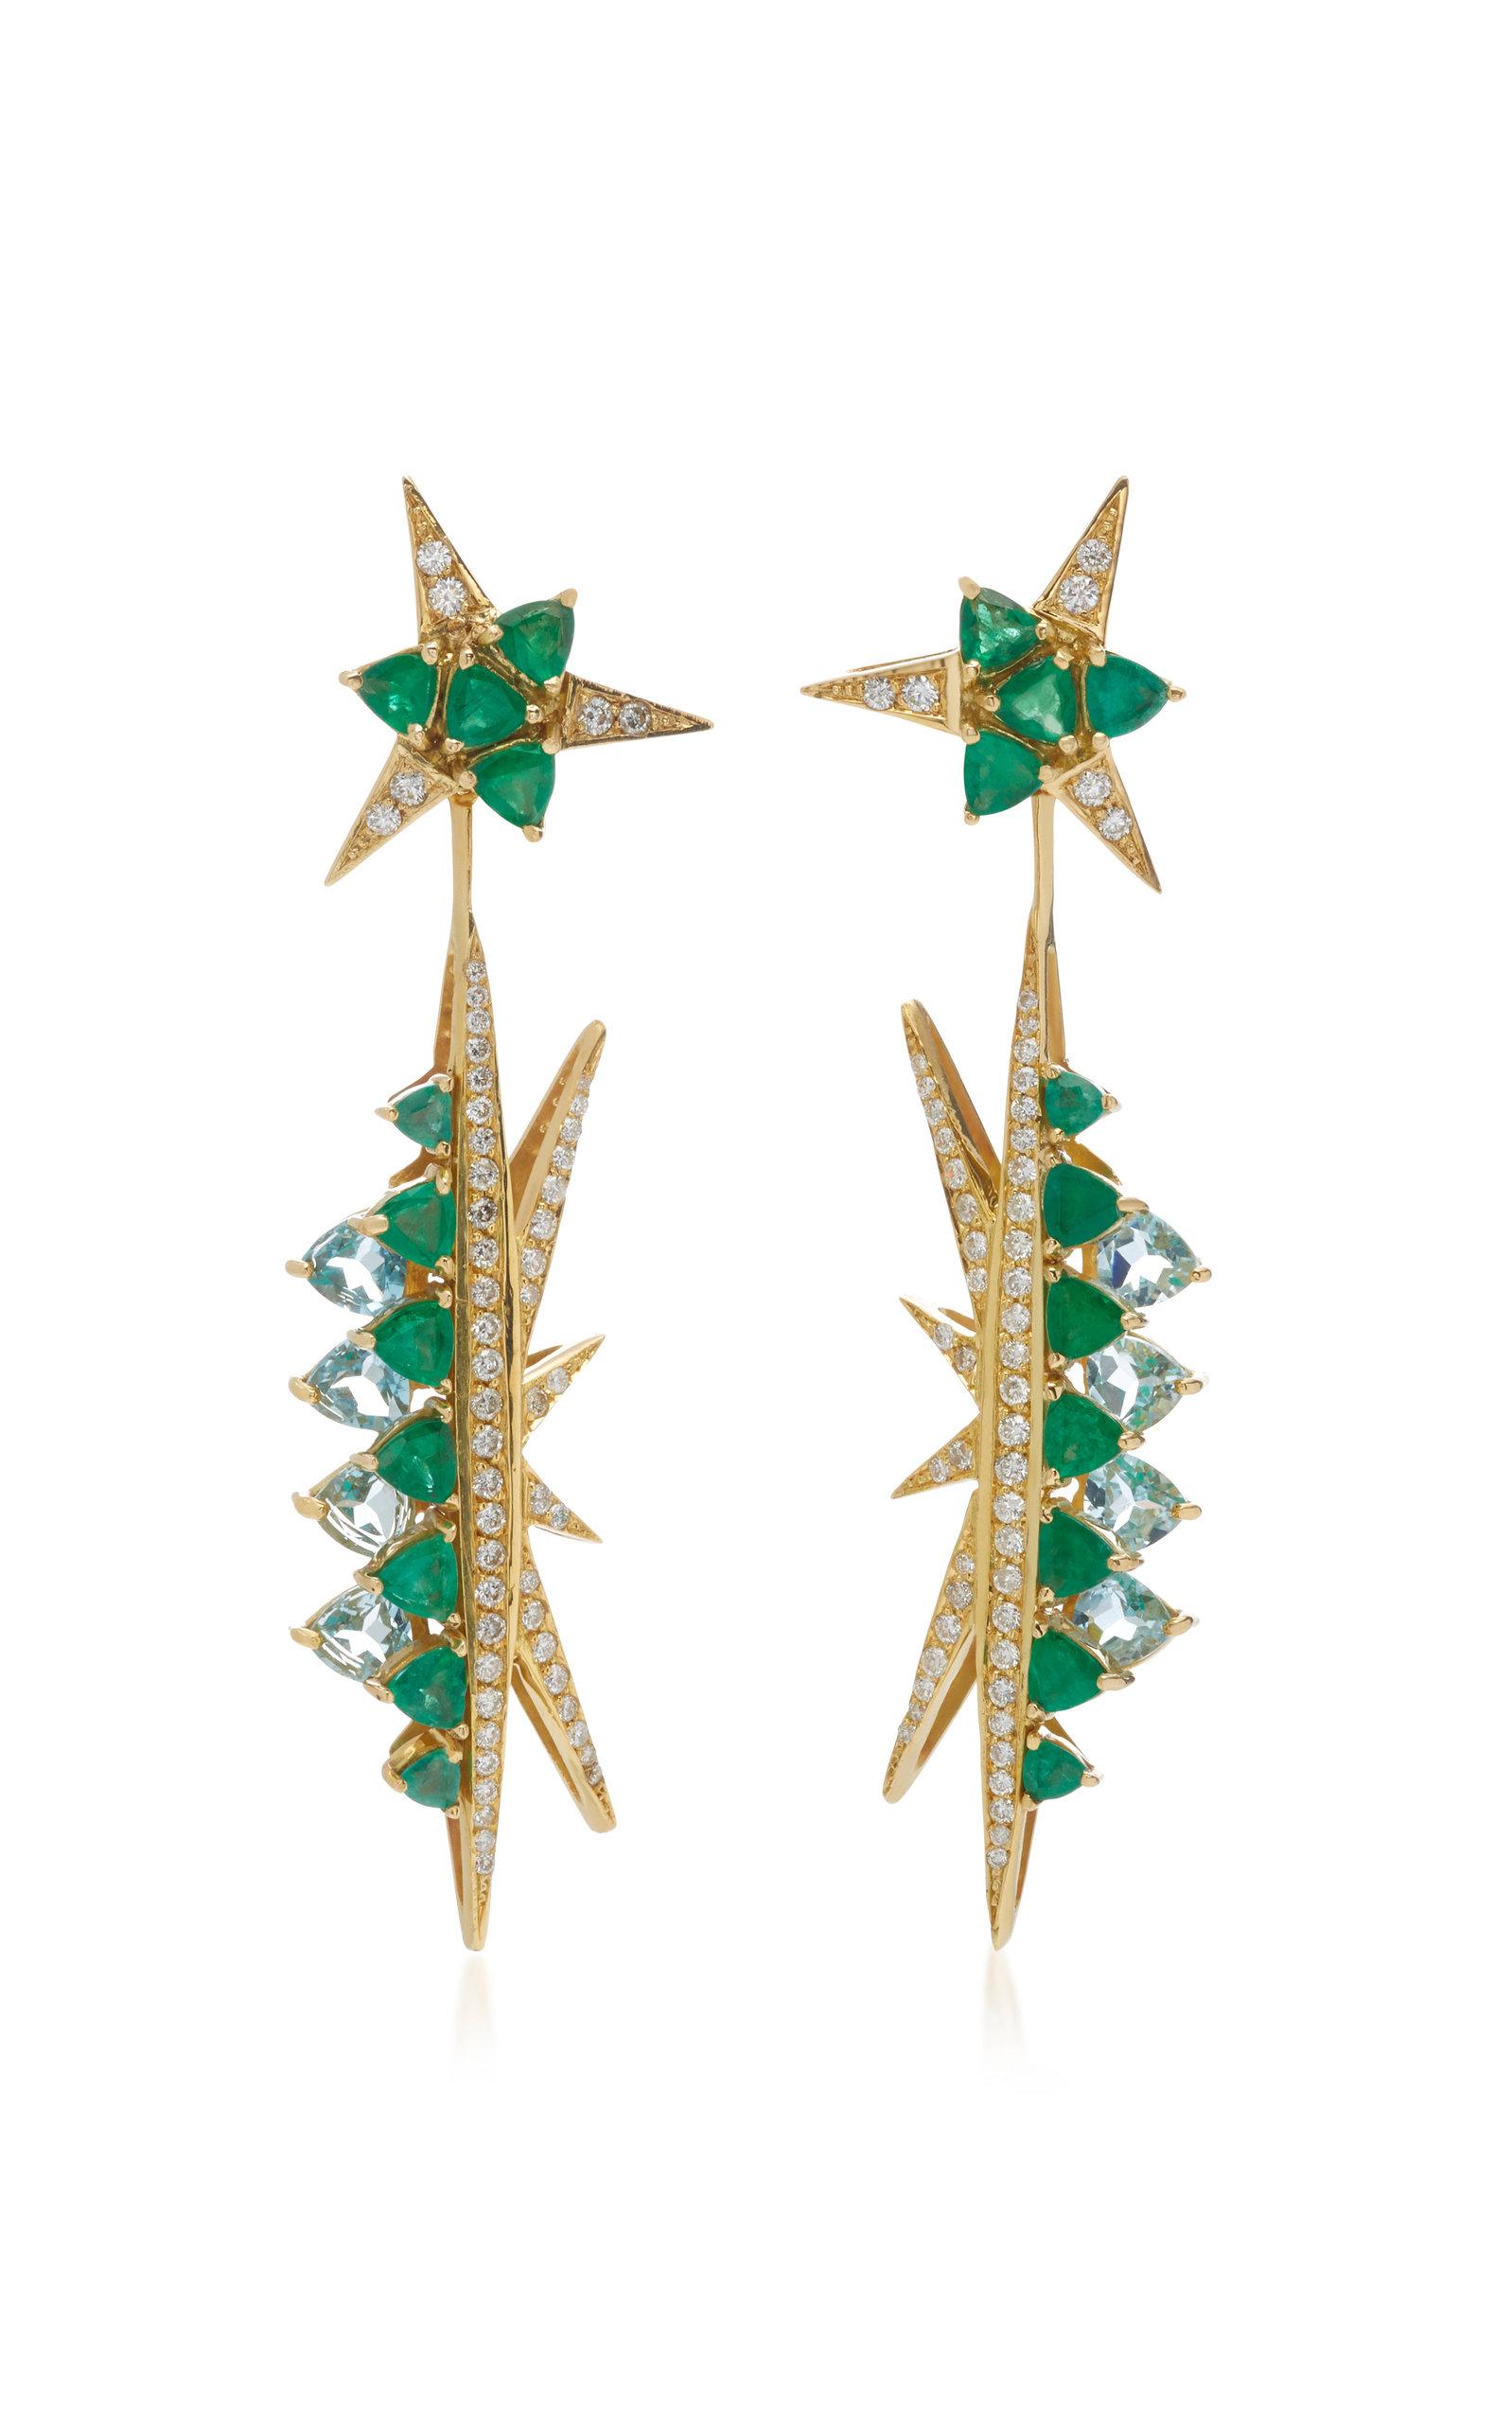 CAROL KAUFFMANN Galactic Electra 18K Gold Emerald Blue Topaz And Diamond Drop Earrings in Green